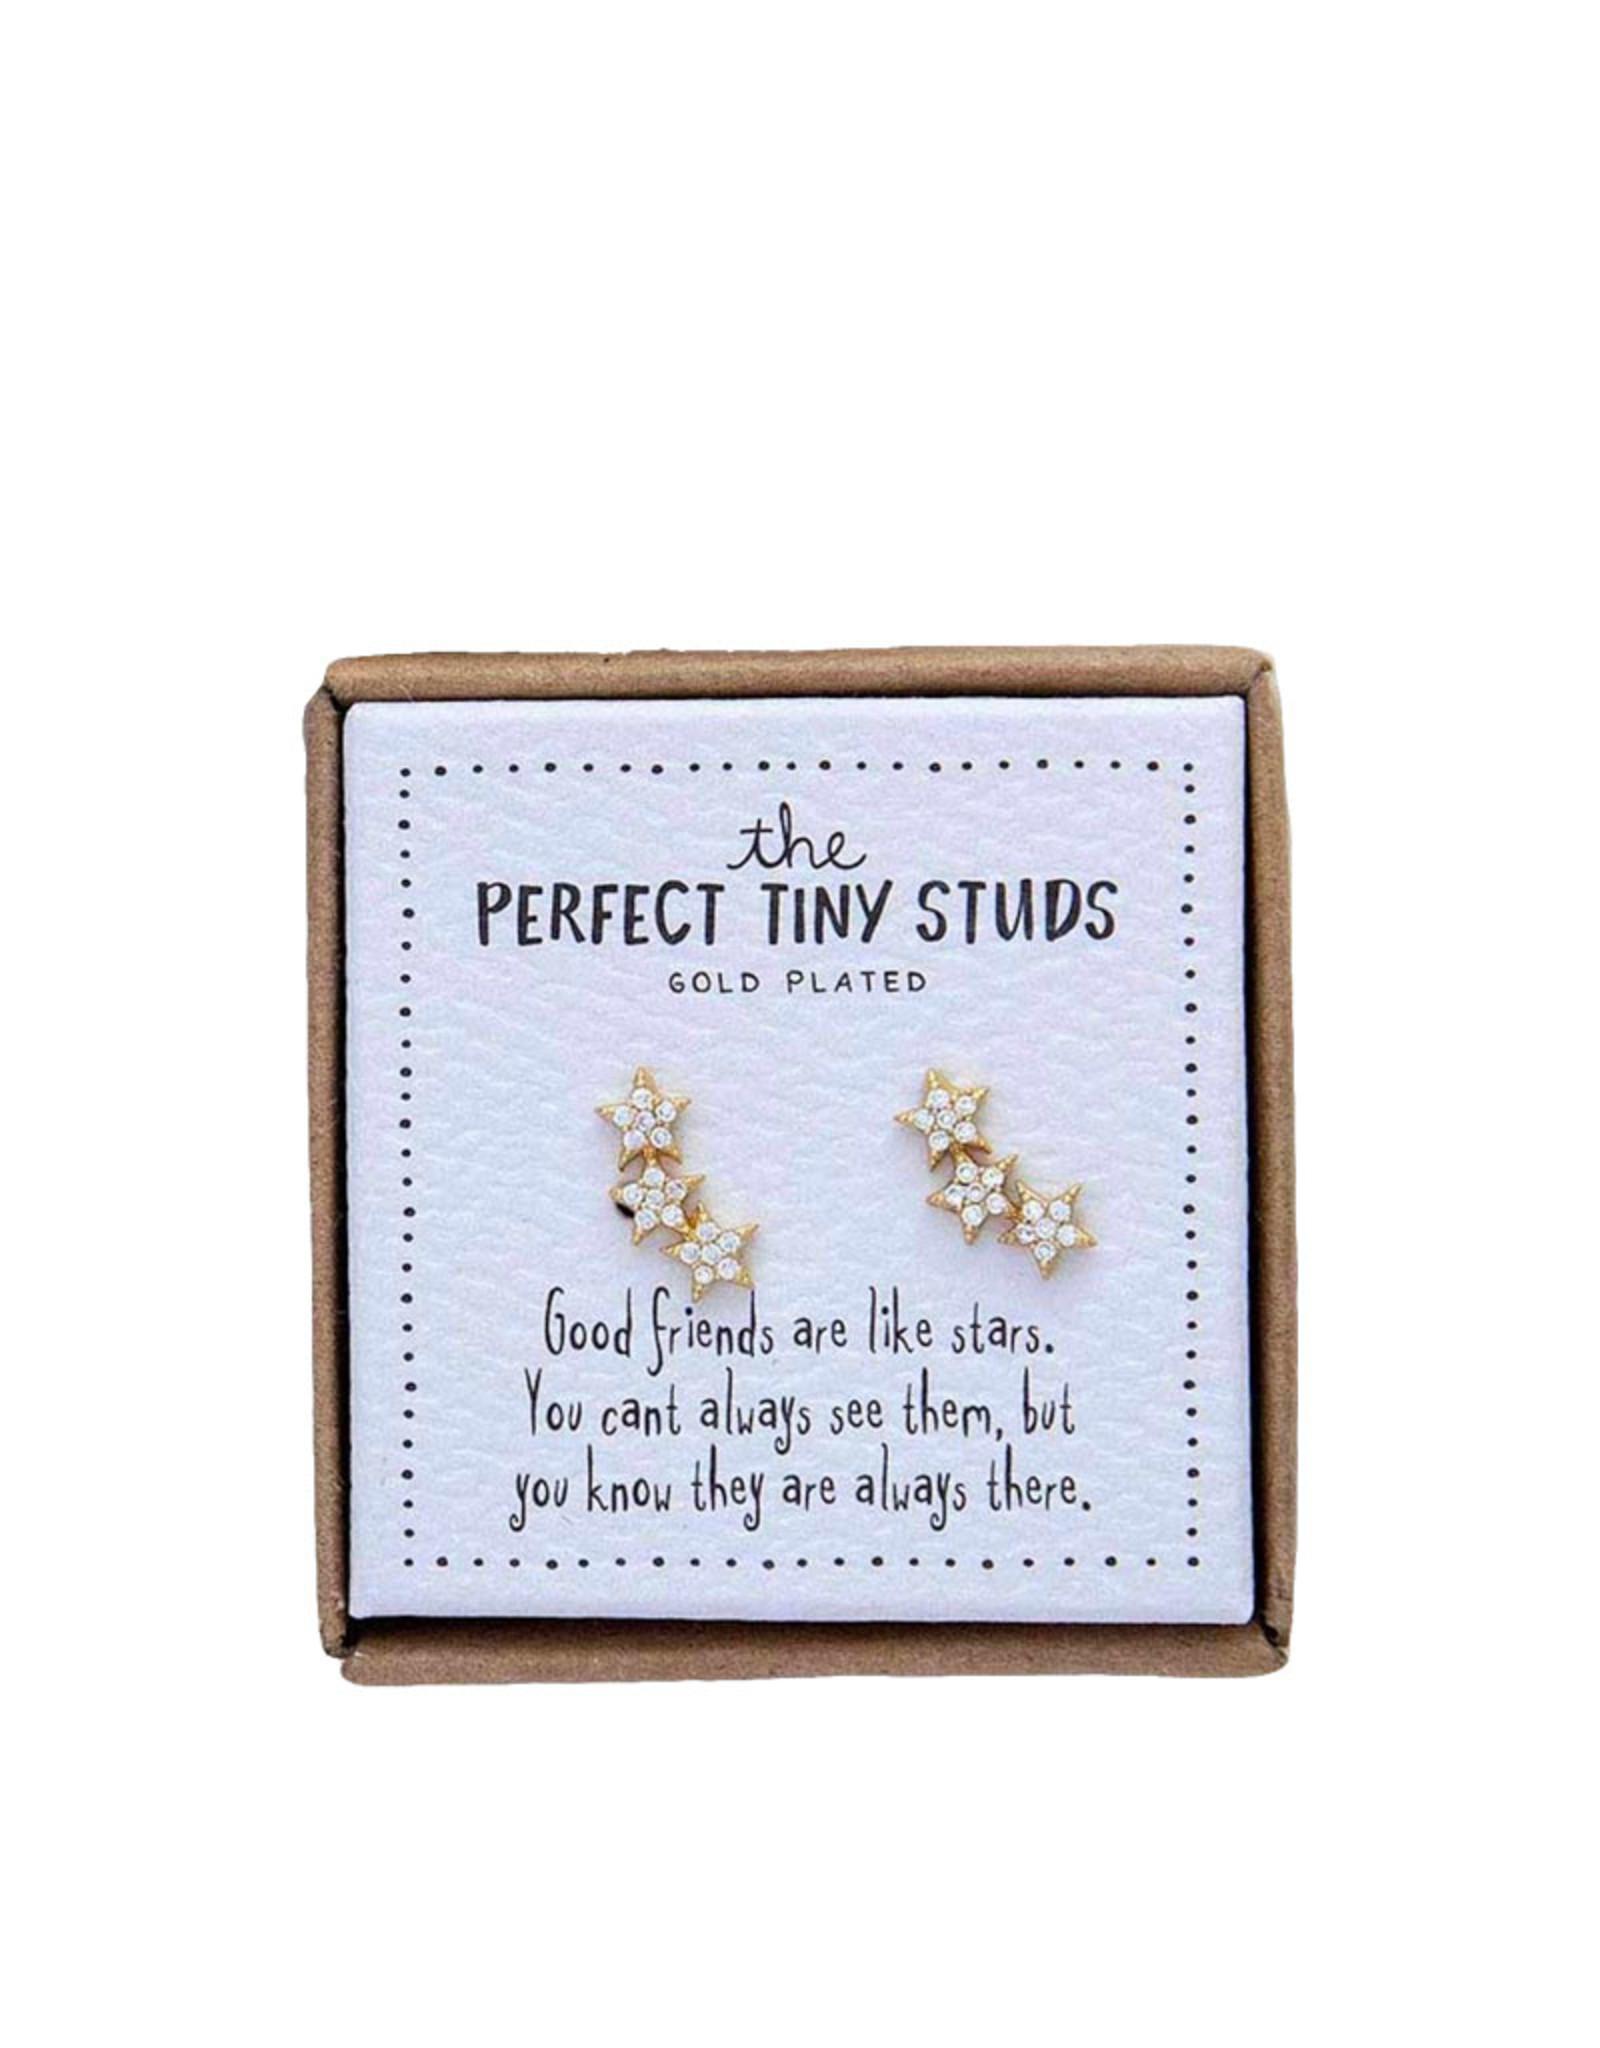 Noi Three tiny stars studs earrings - gold plated